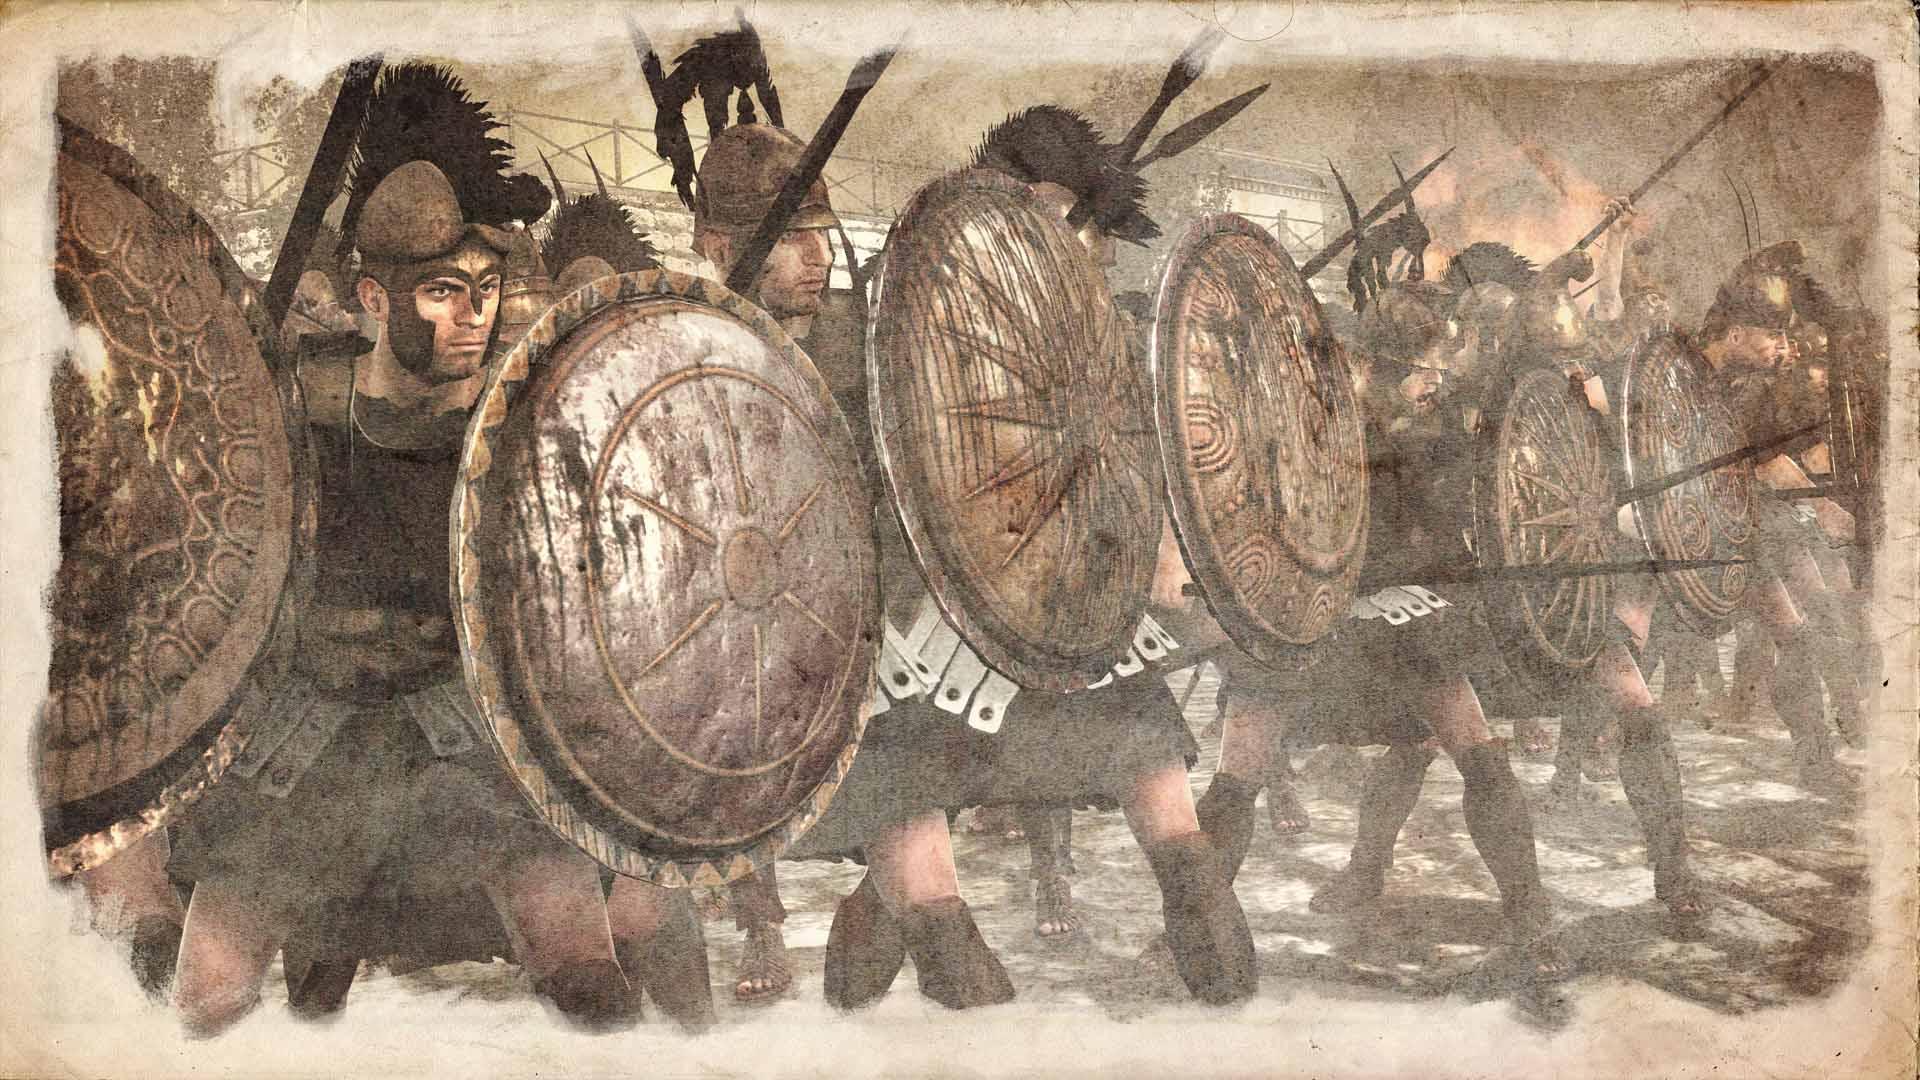 Image - Total War Rome II Artwork 1.jpg - Steam Trading